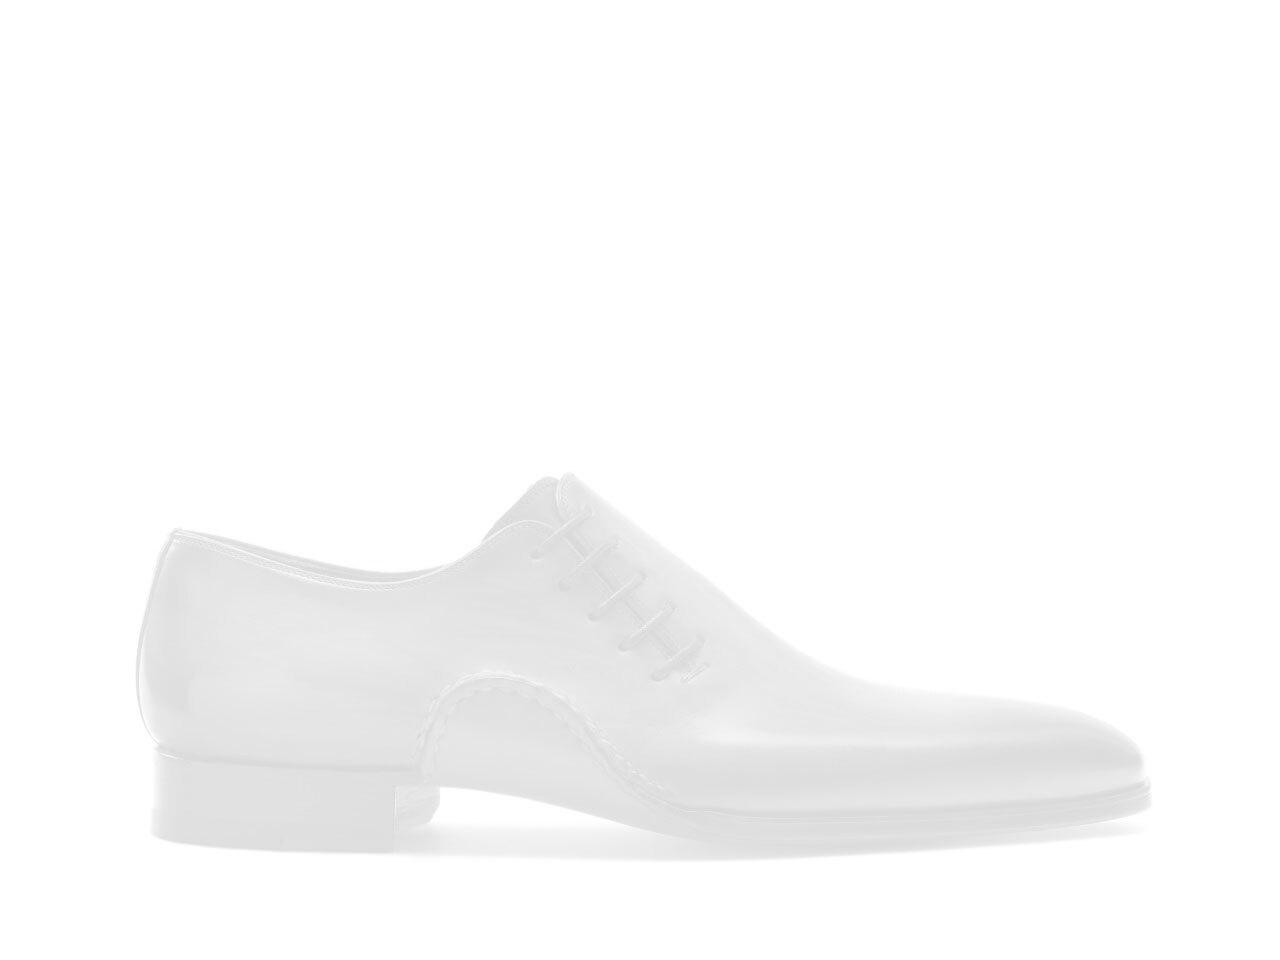 Sole of the Magnanni Montijo Cognac Men's Driving Shoes